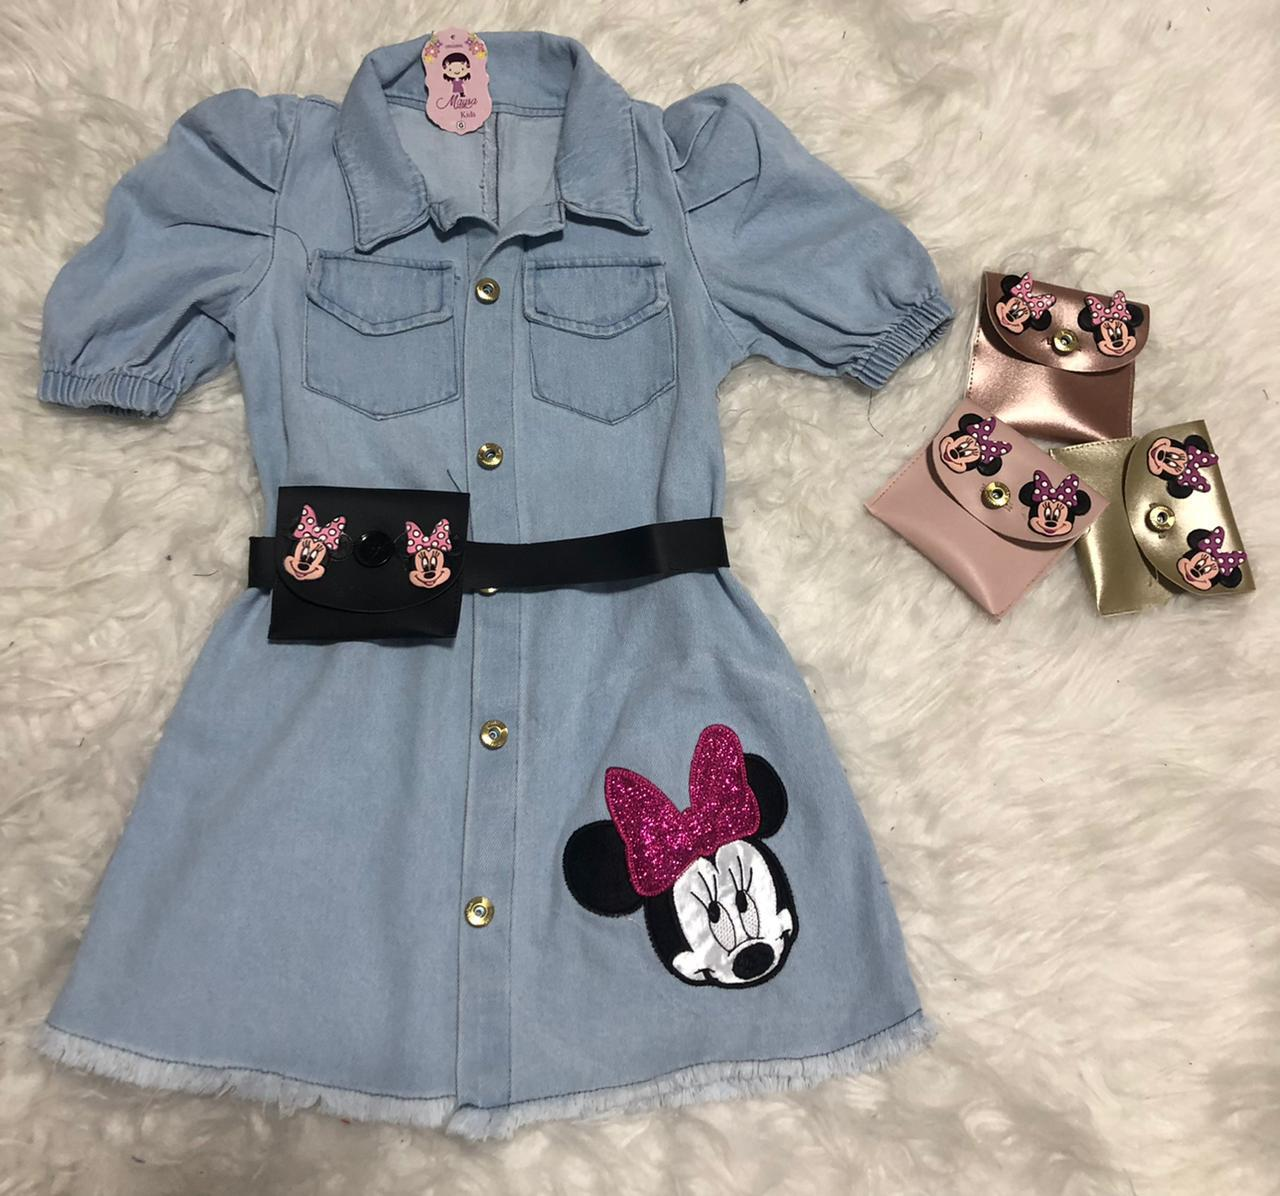 Vestido Infantil Jeans com Pochete Minnie Passarinho Kids